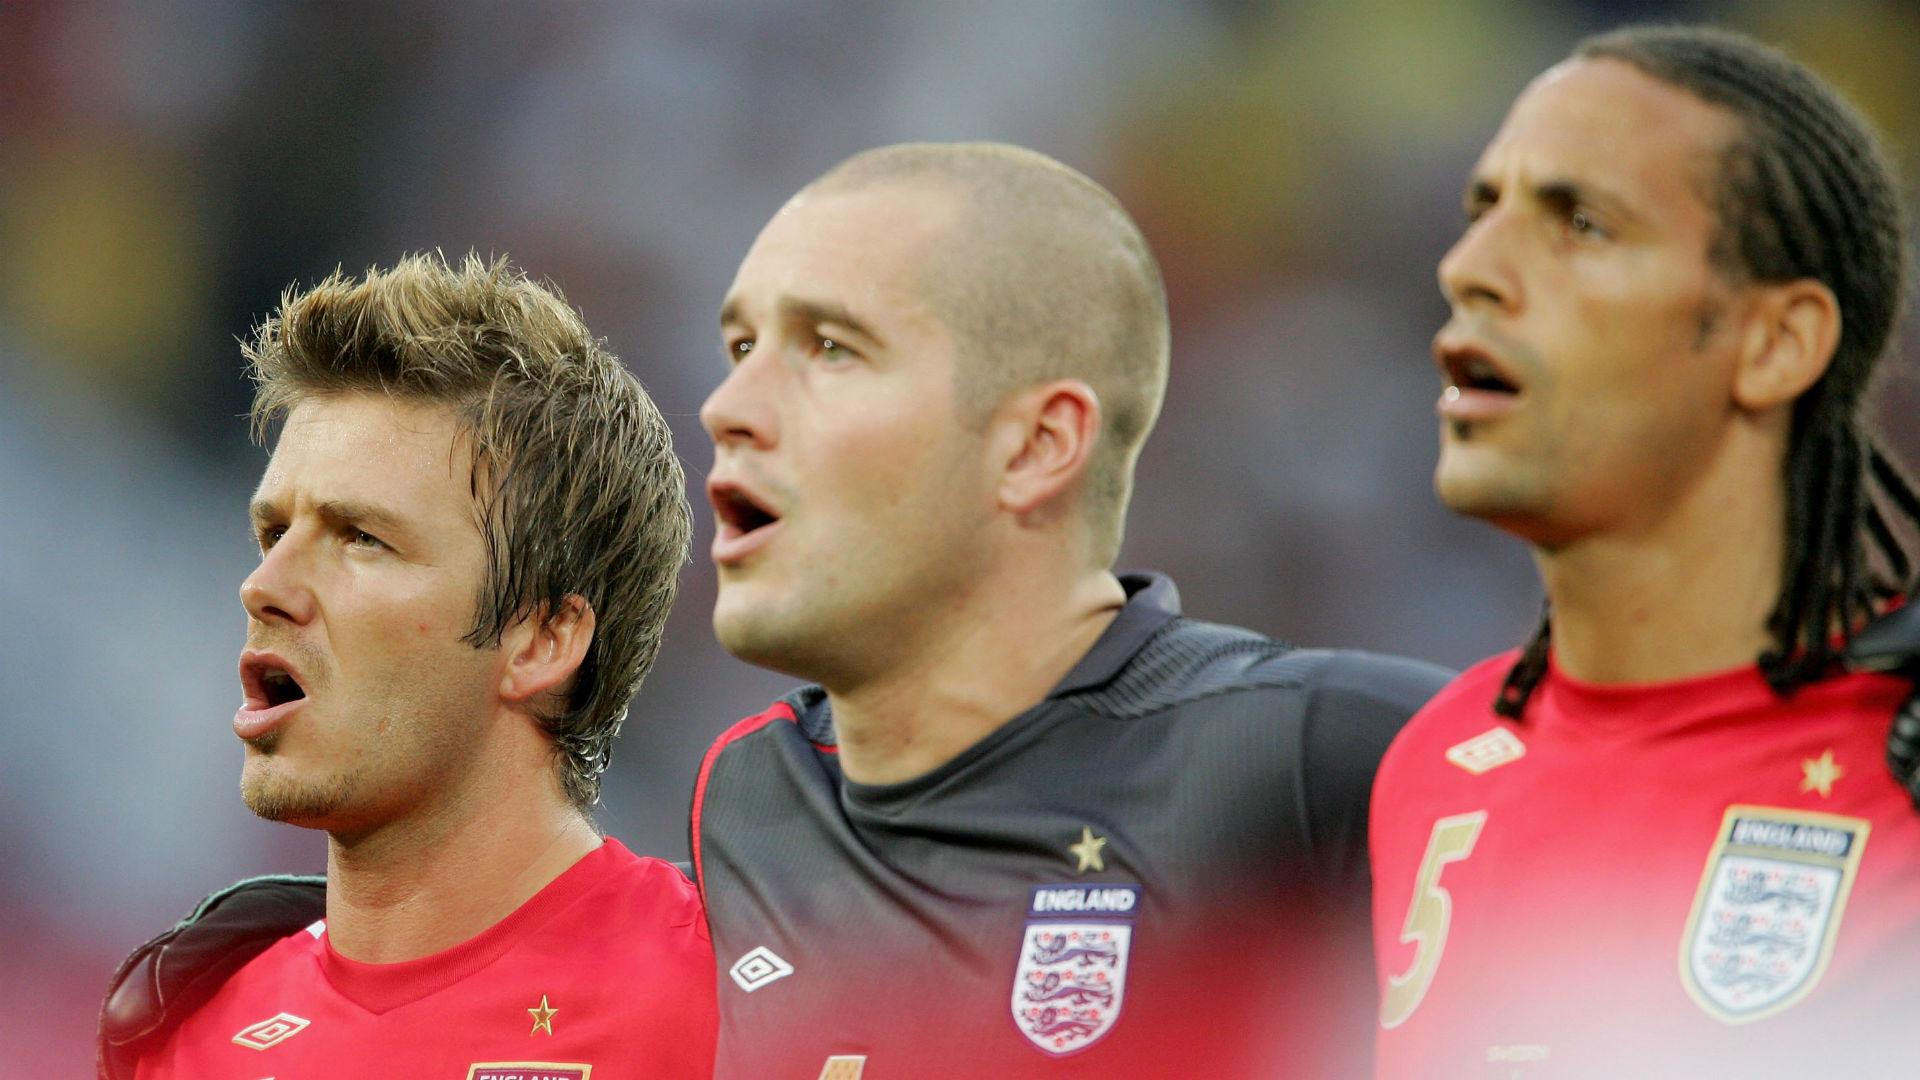 david beckham paul robinson rio ferdinand england world cup 2006 1kgc0v1q5gd5a1iv9lz8gewei2